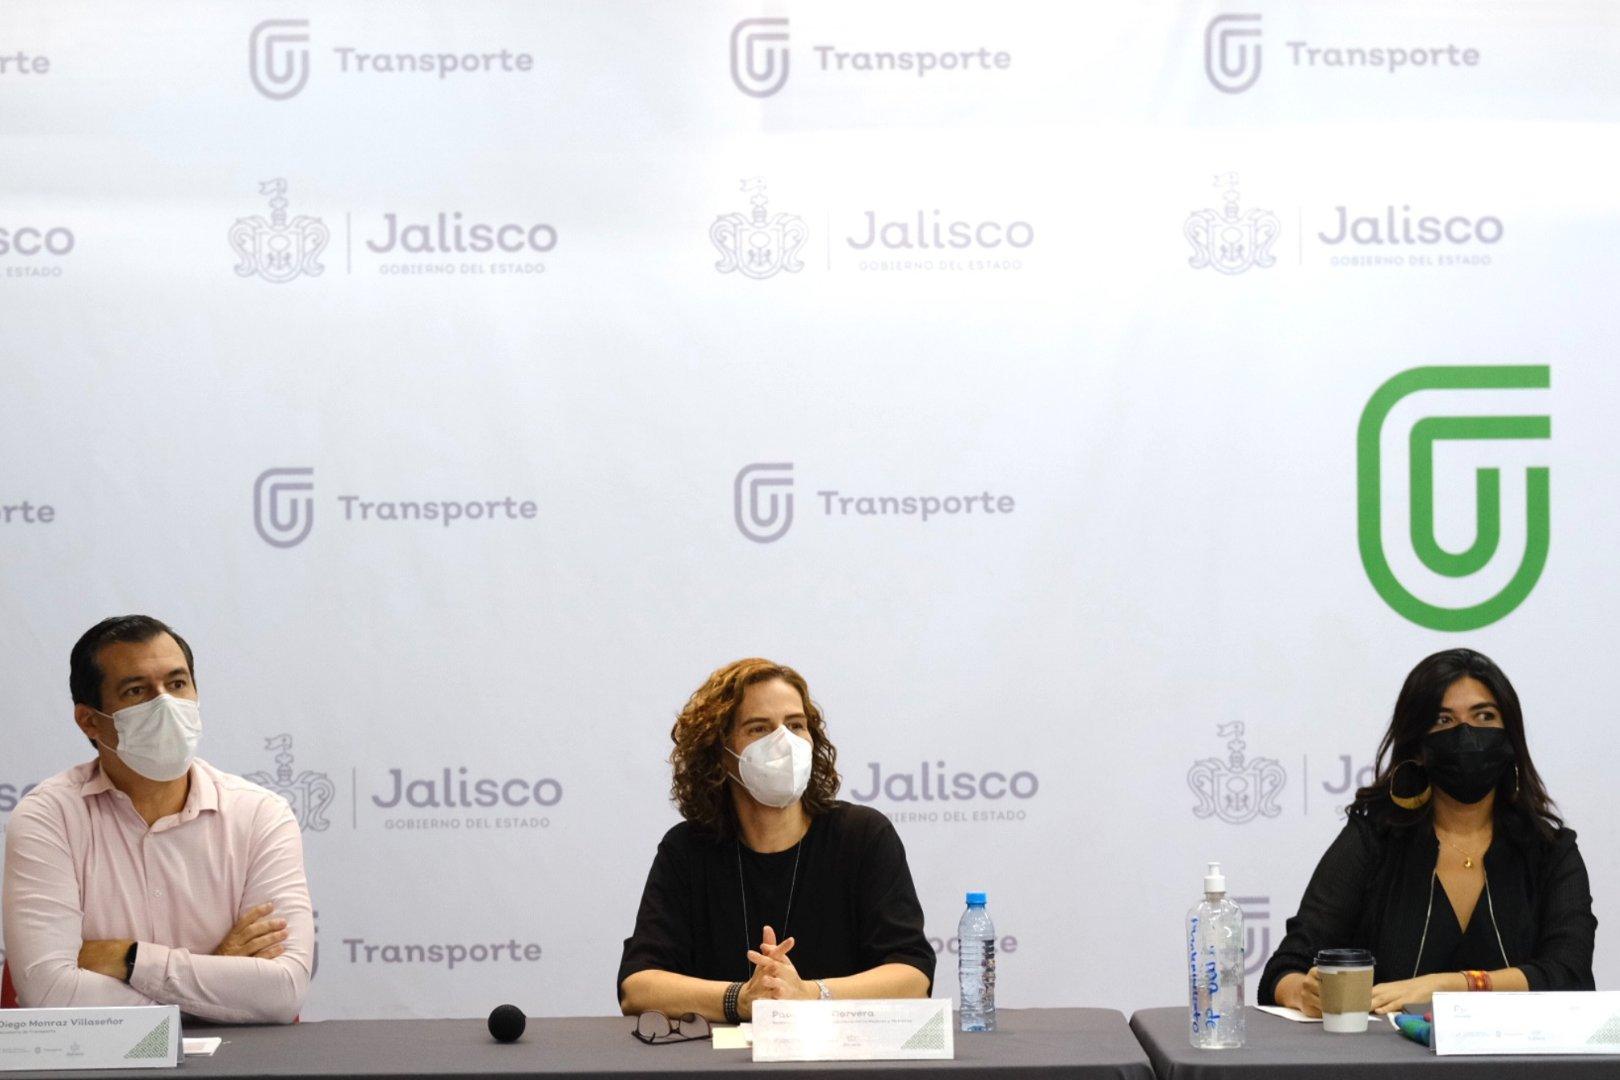 Jalisco Mujeres Conductoras